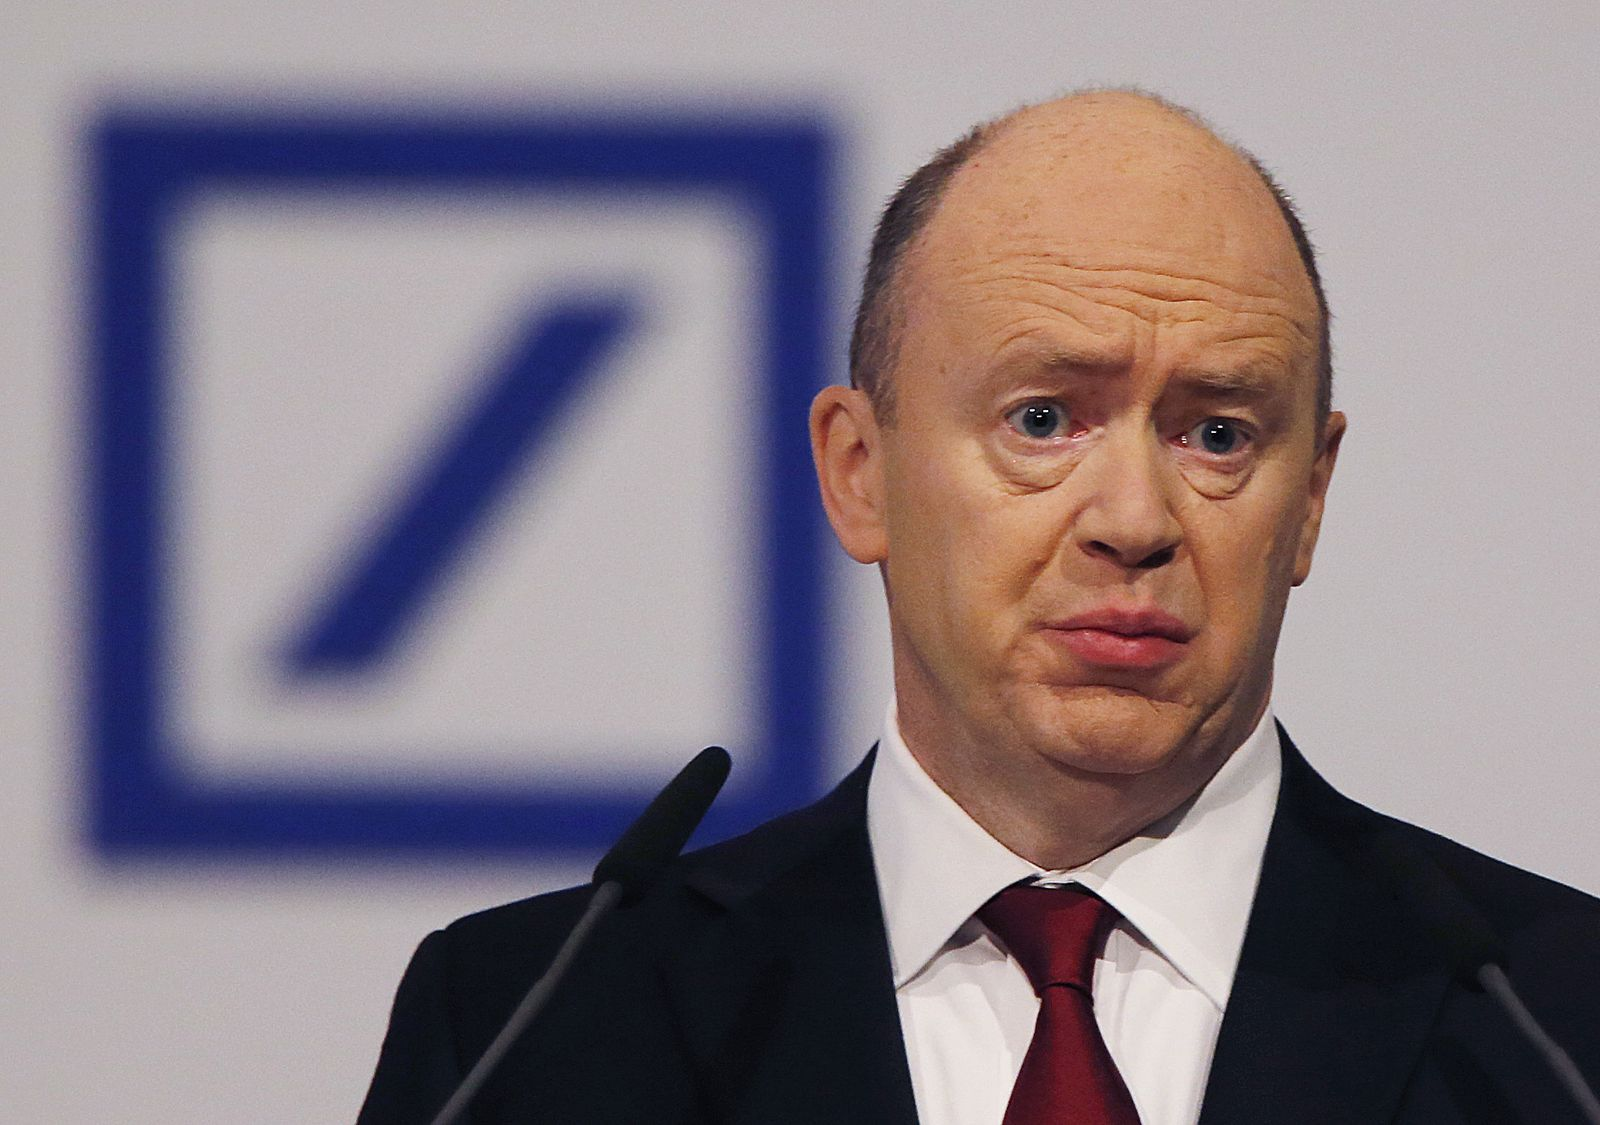 John Cryan Deutsche Bank